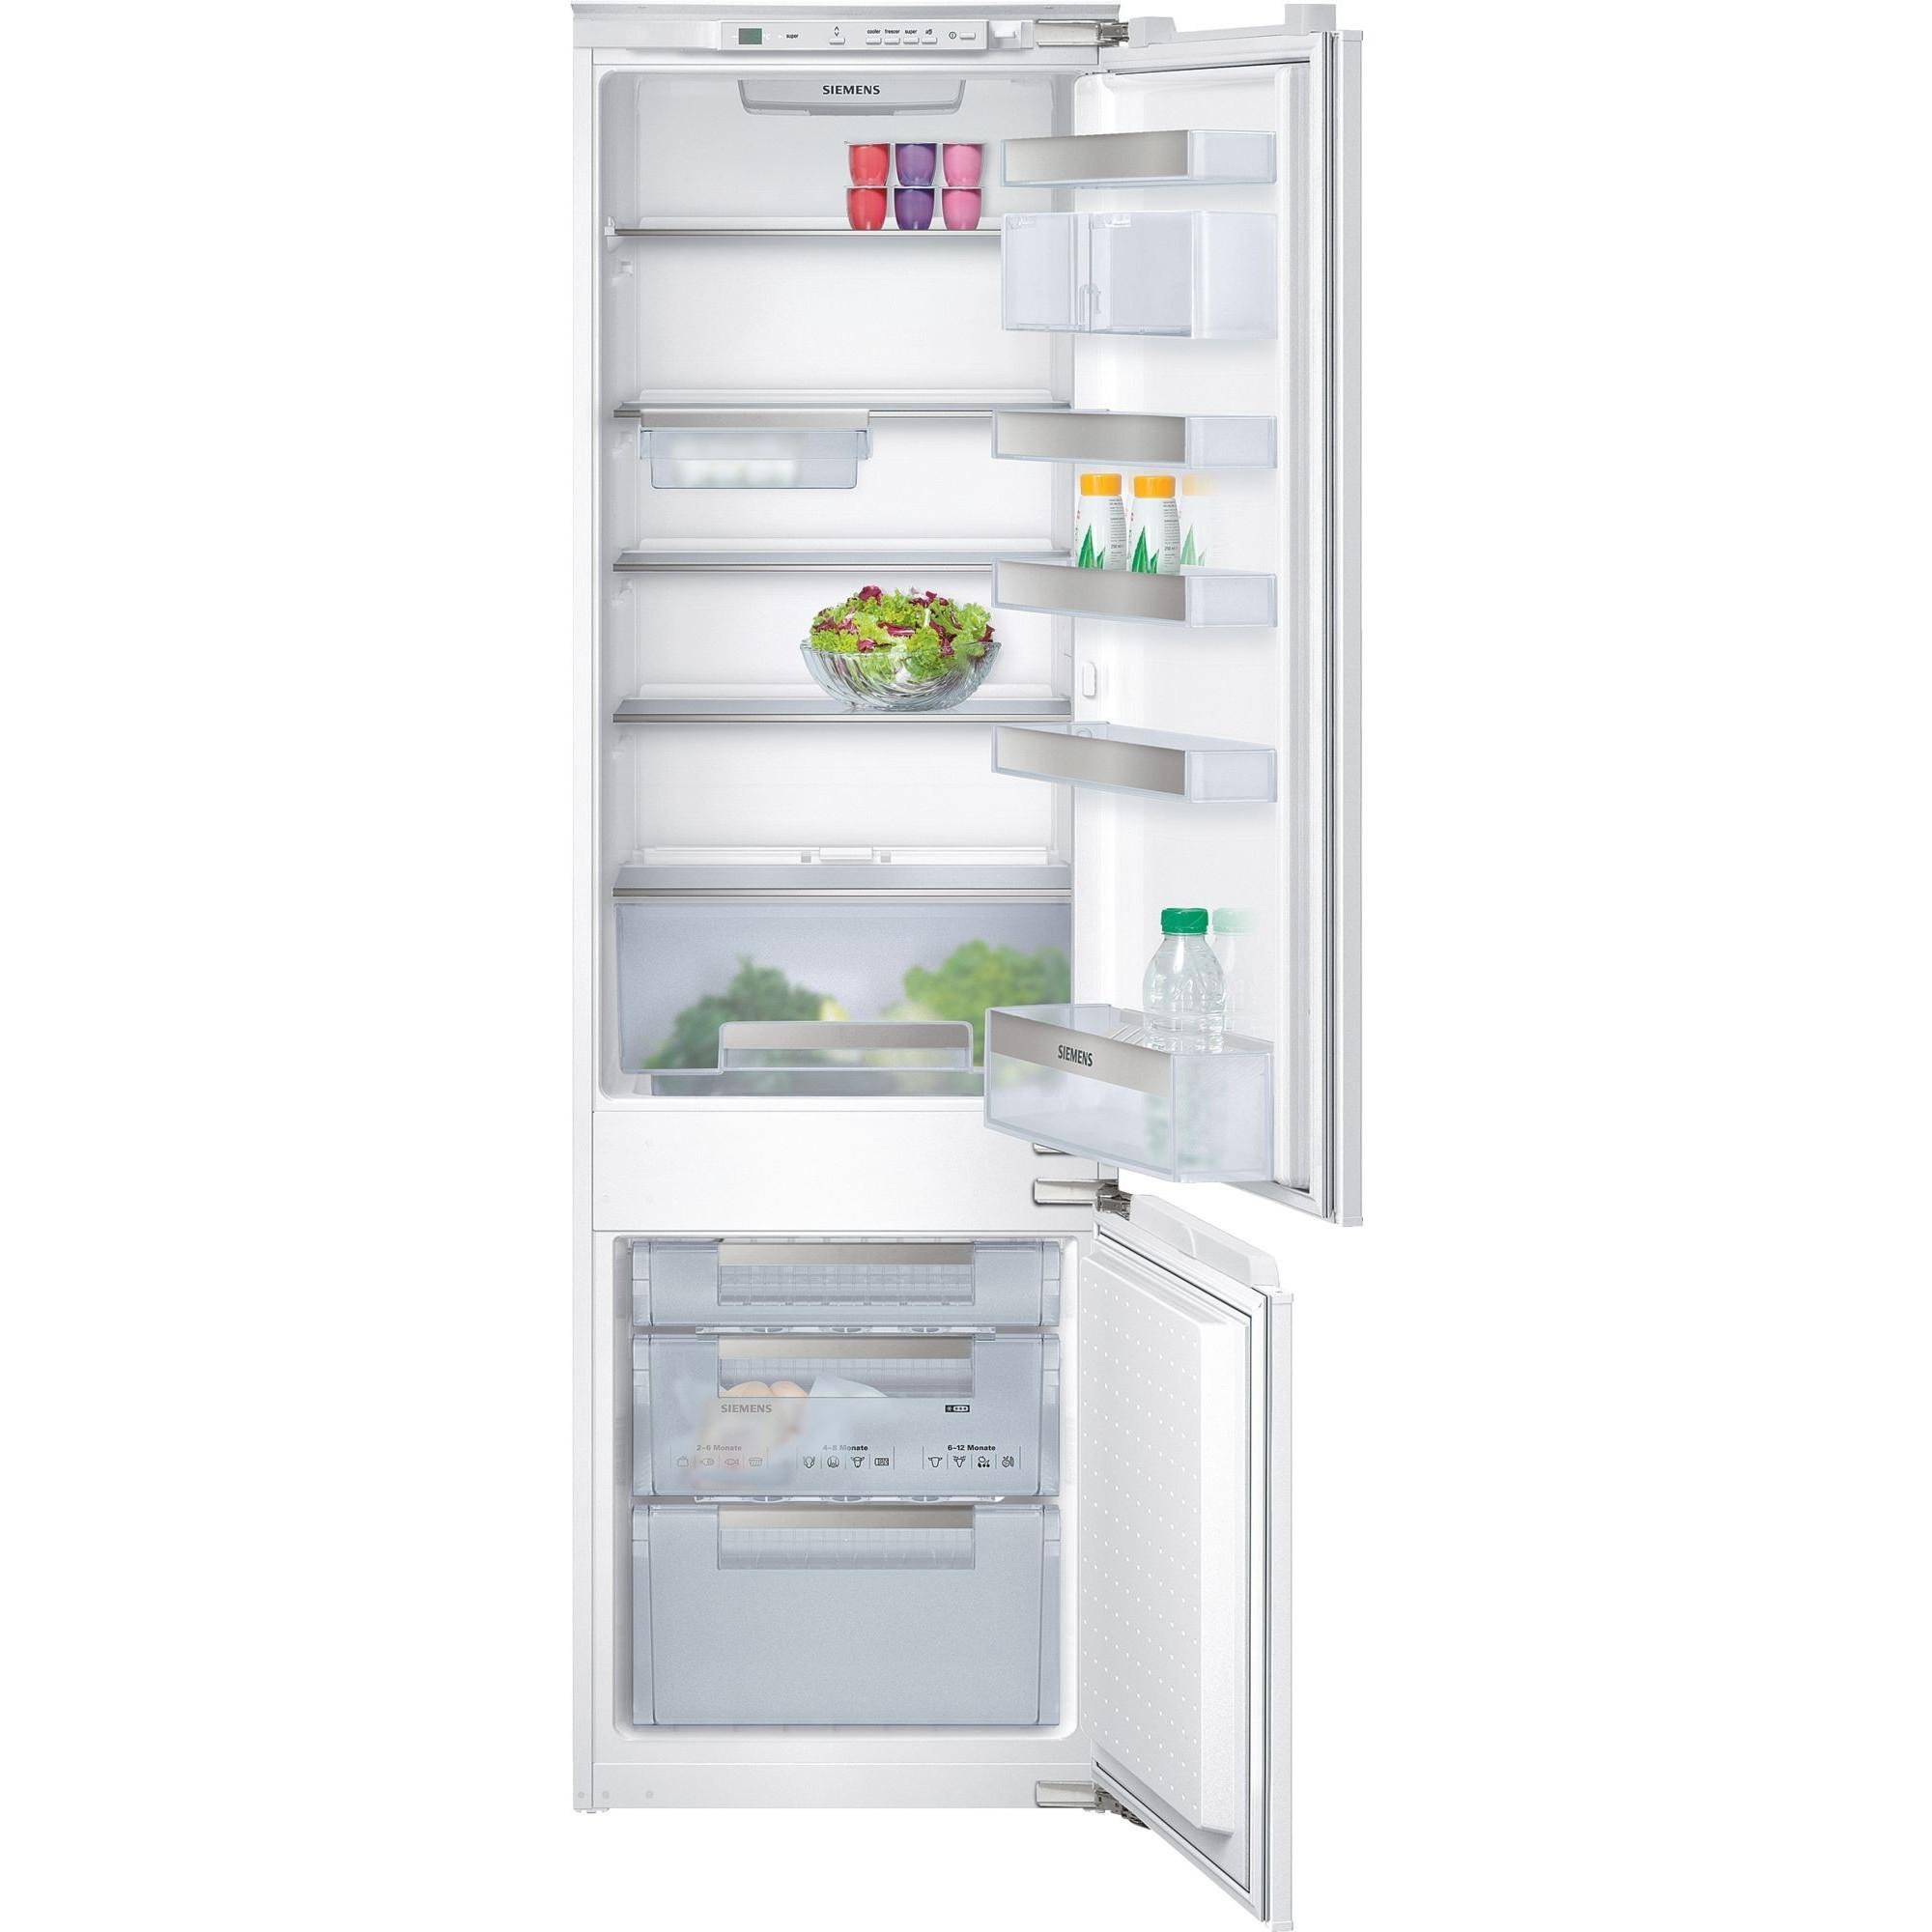 Встраиваемый холодильник Siemens KI 38SA50